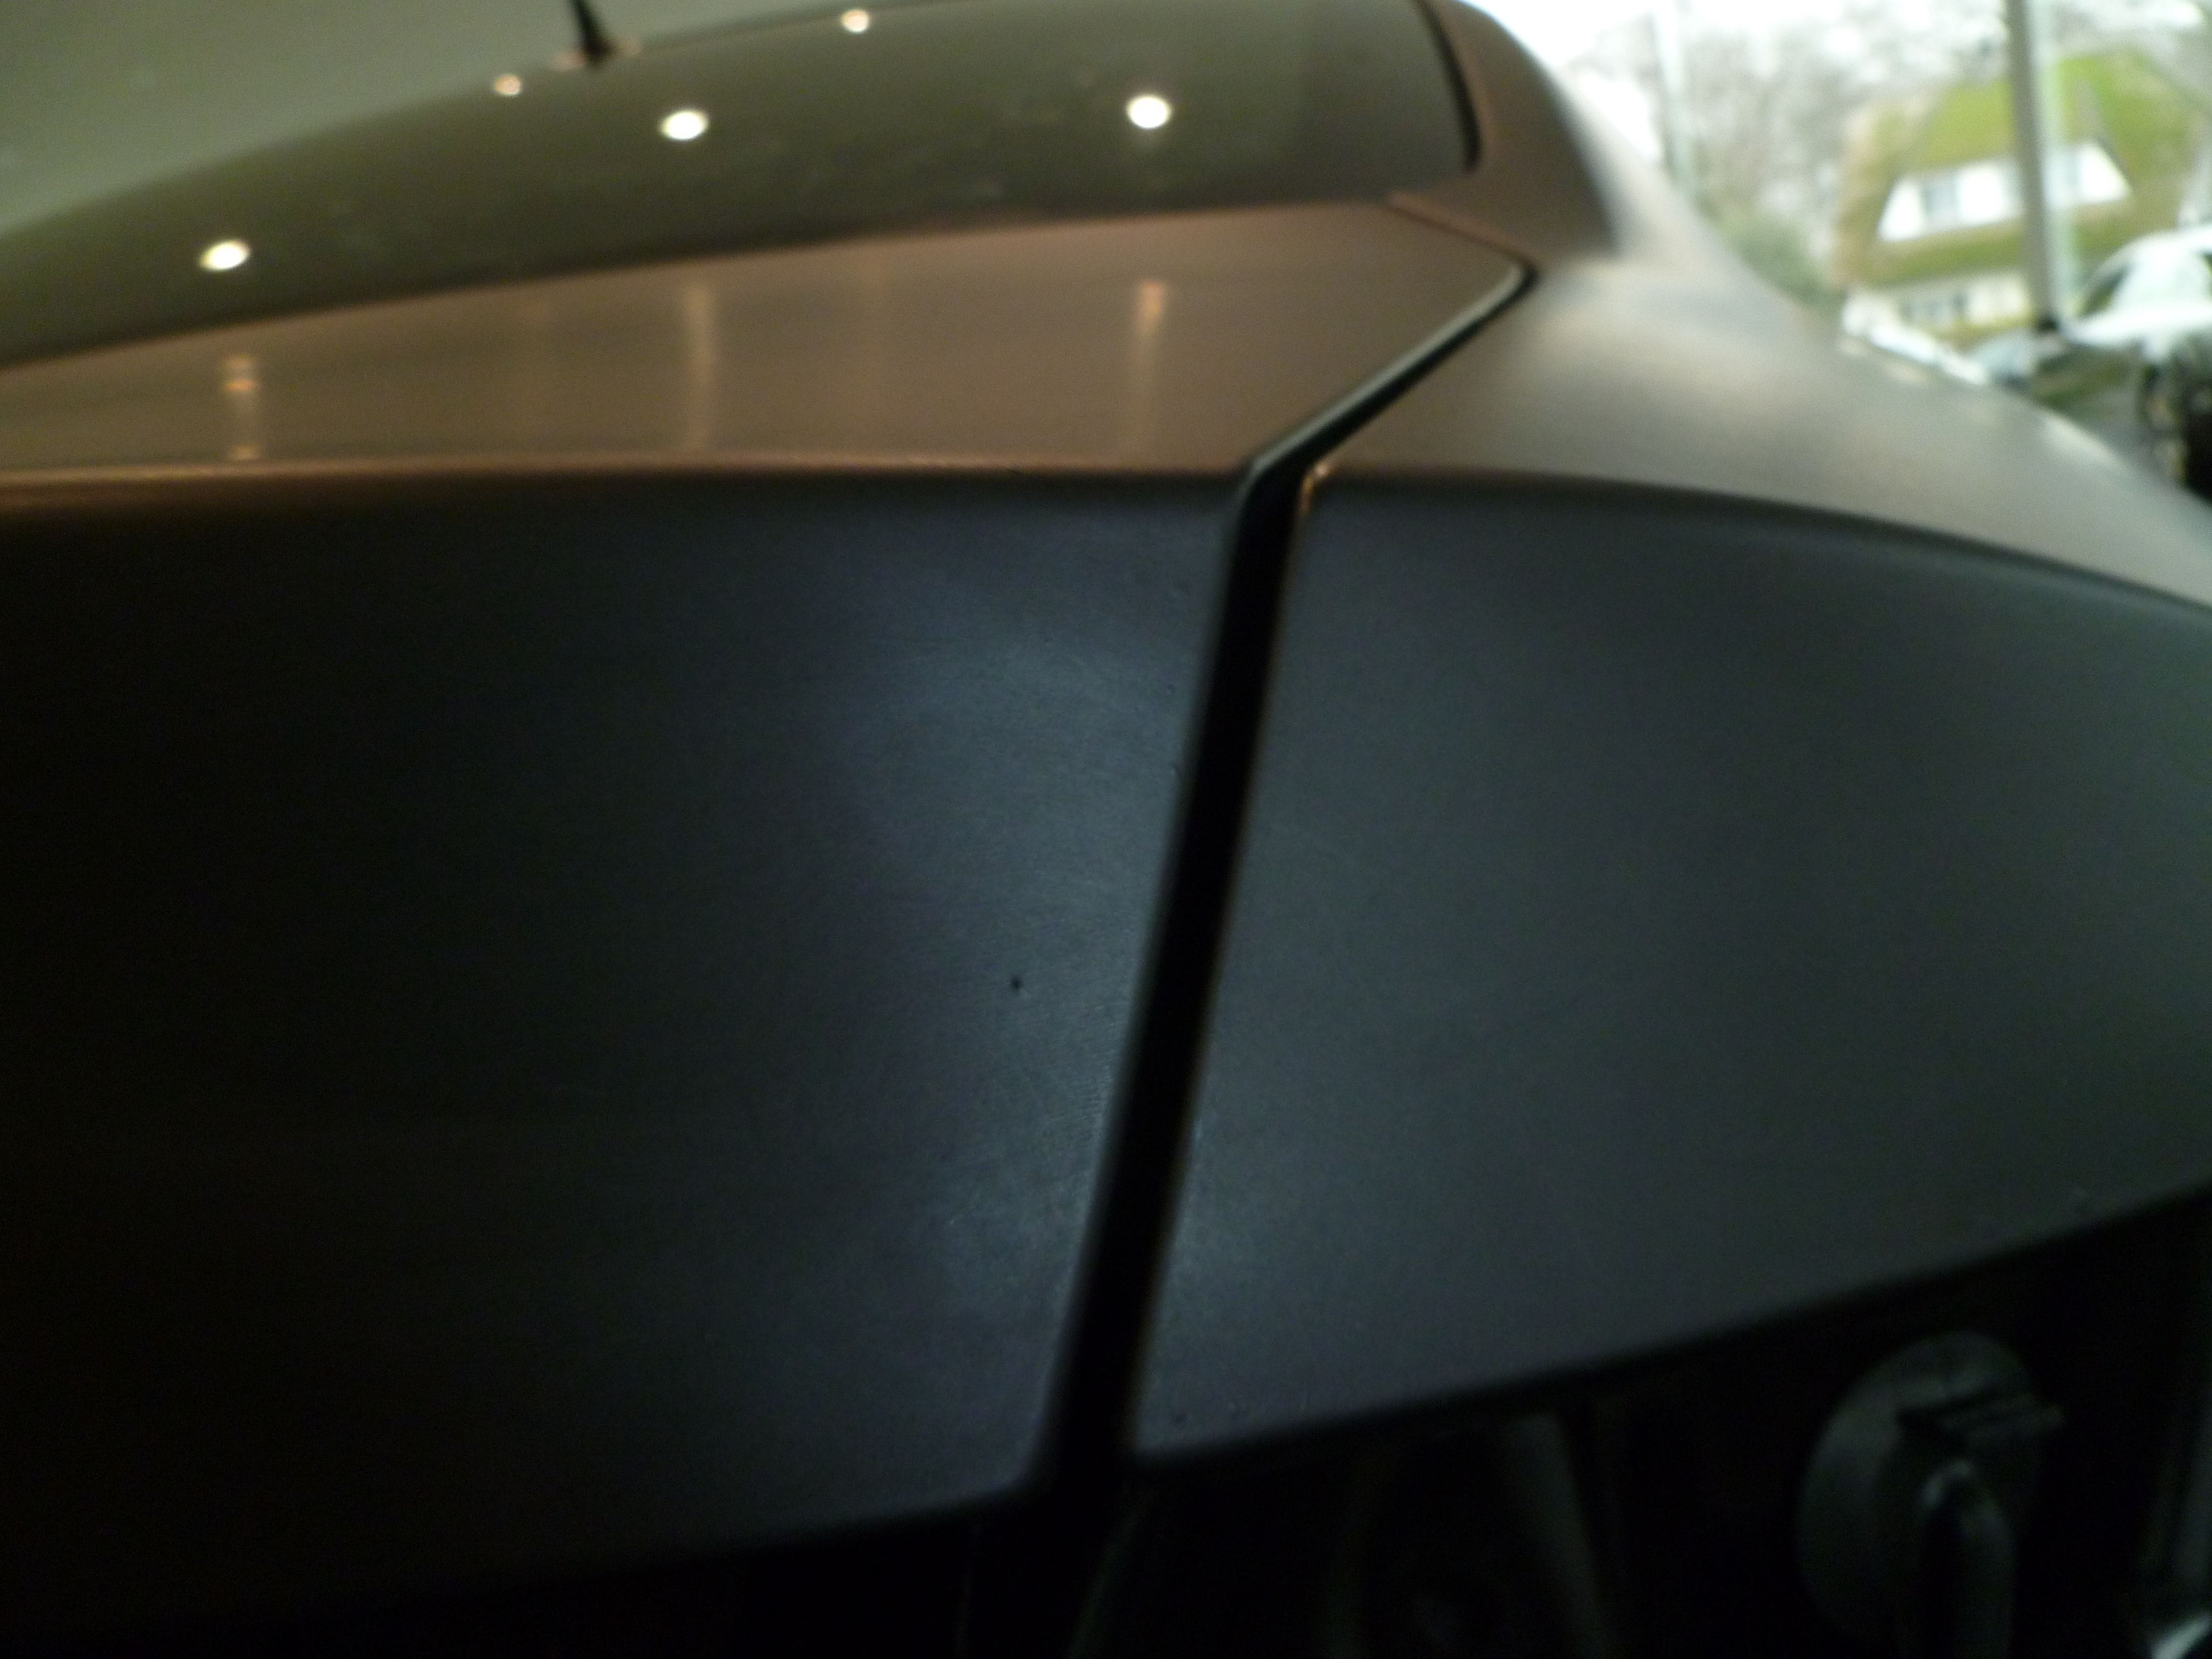 Audi A5 Coupe met Mat Zwarte Wrap, Carwrapping door Wrapmyride.nu Foto-nr:4627, ©2021